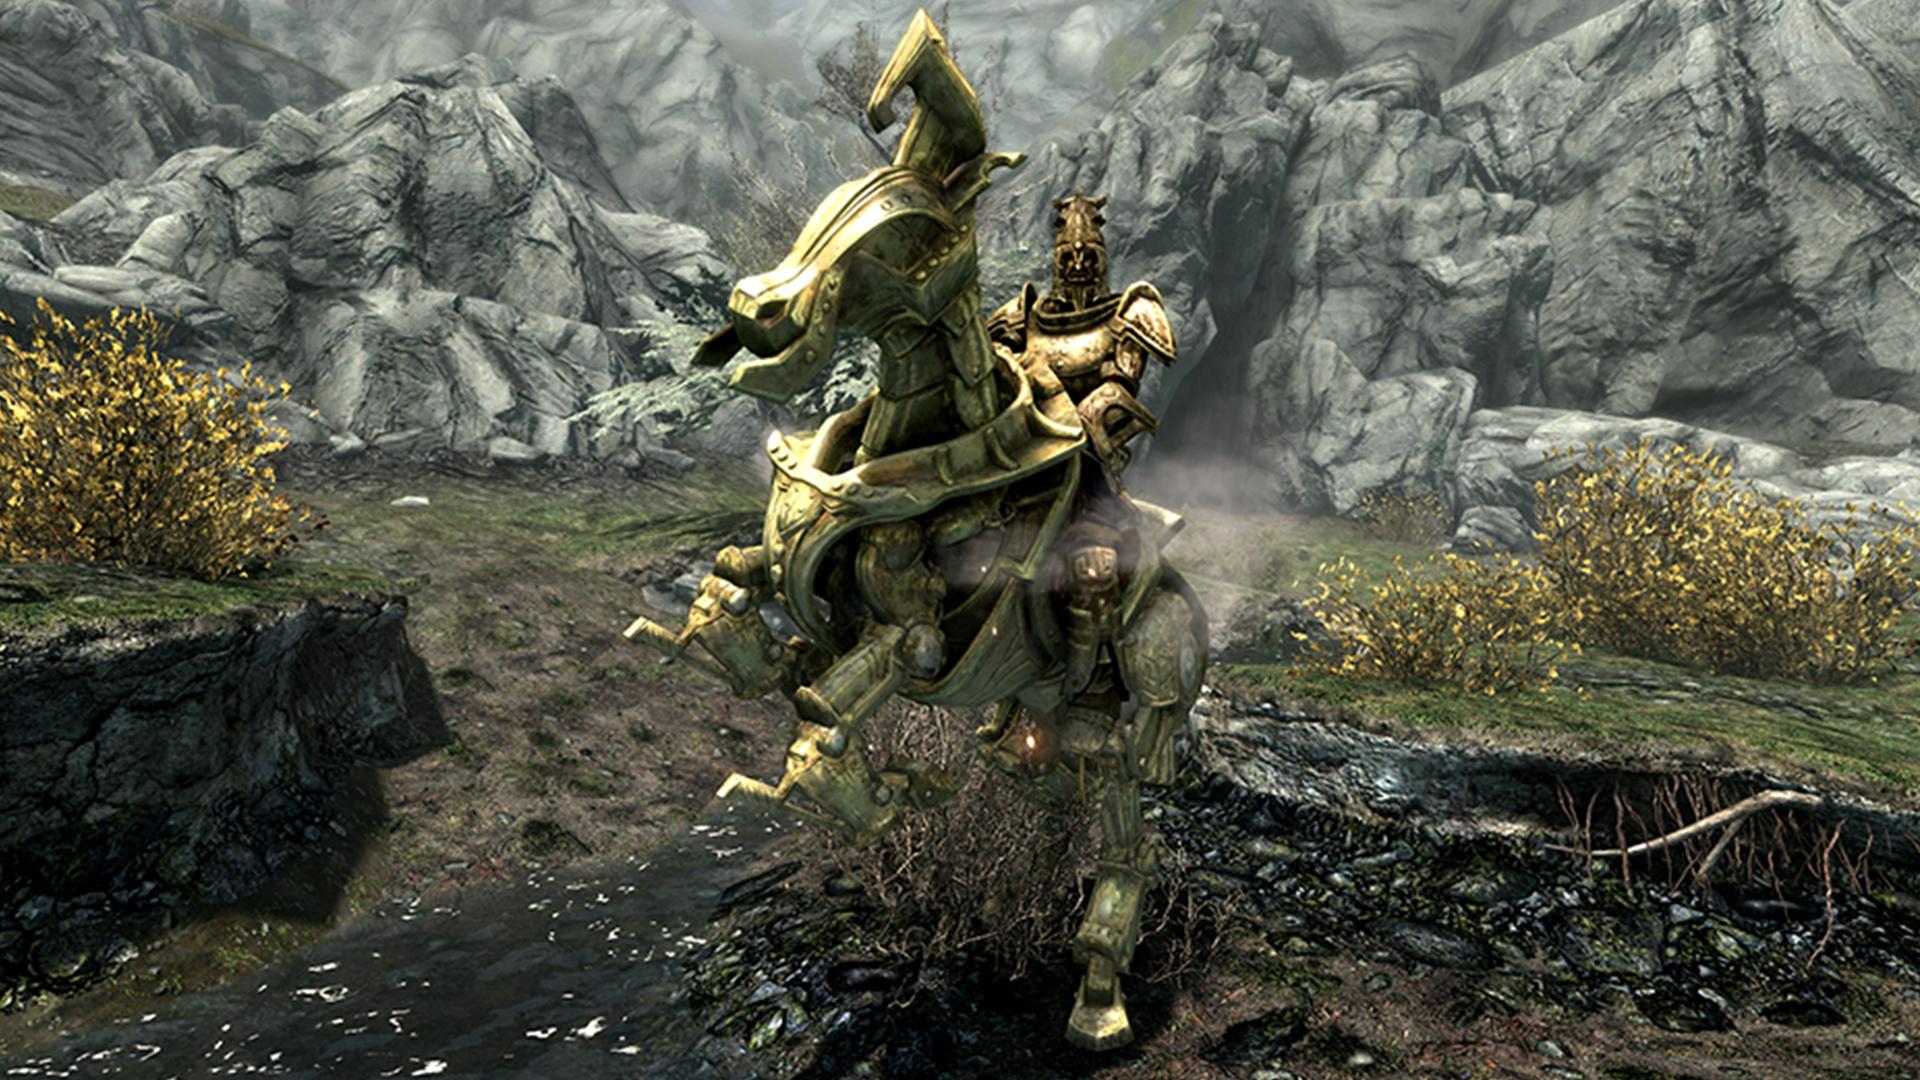 Light Skyrim Armor Dwarven